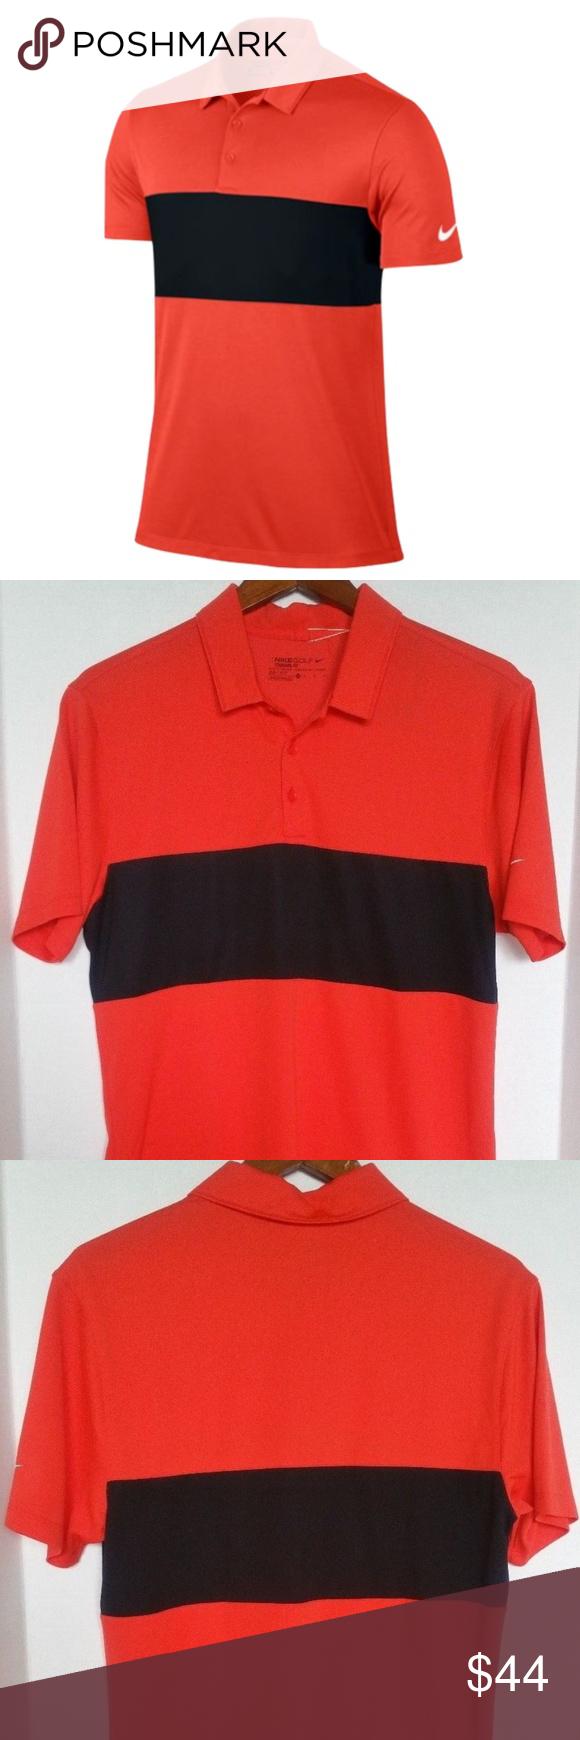 8a596ced0 Nike Men Breathe Red Black Polo Golf Dri Fit Shirt Nike Mens Breathe Block  Polo Golf